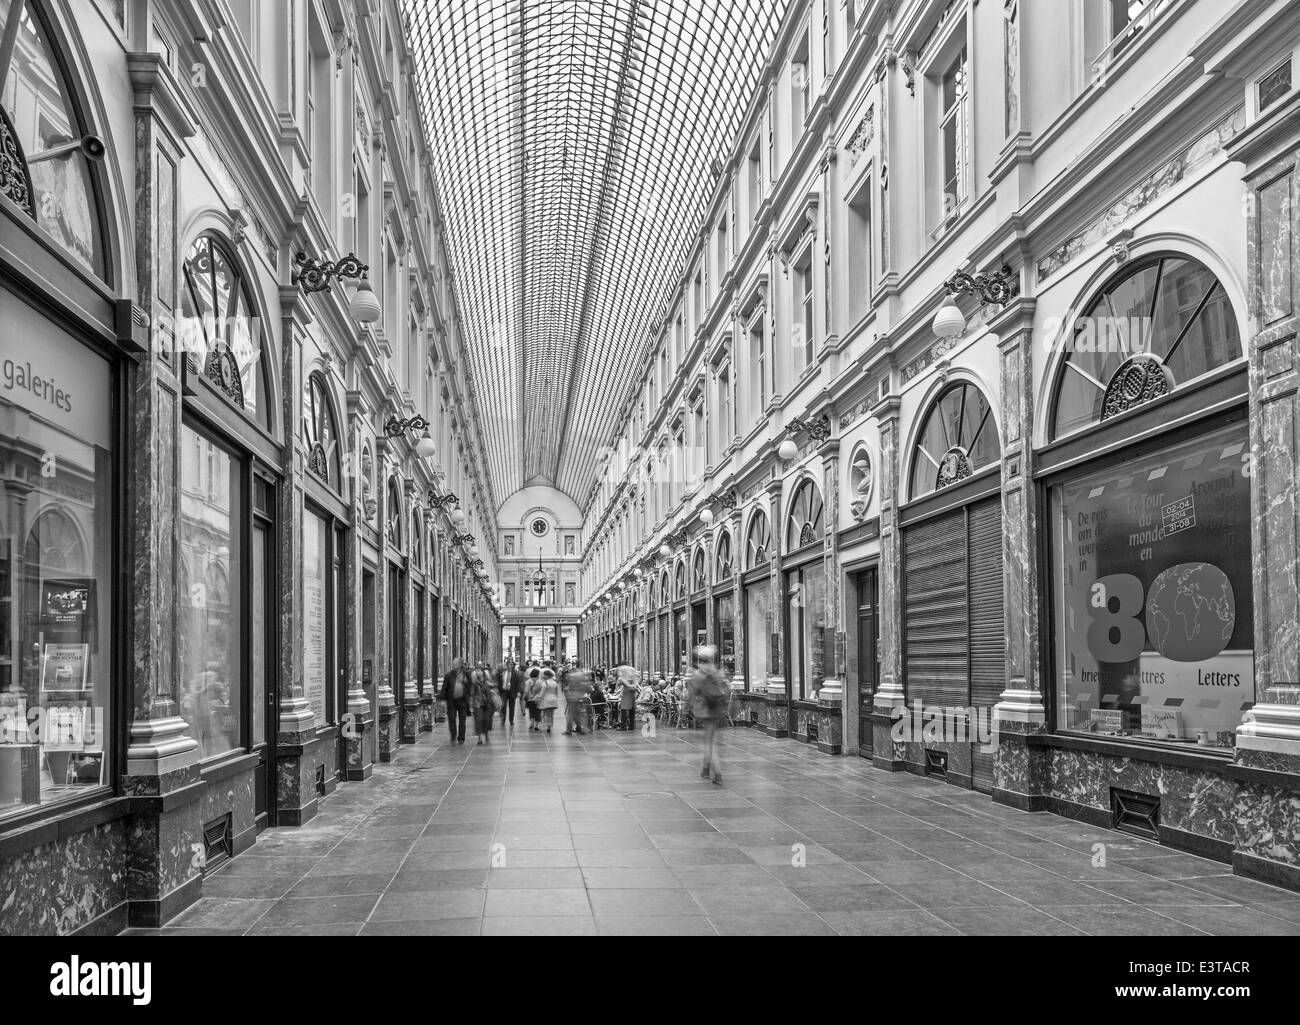 BRUSSELS, BELGIUM - JUNE 16, 2014: Royal Galeries of st. Hubert. The galleries was opened in year 1846. - Stock Image